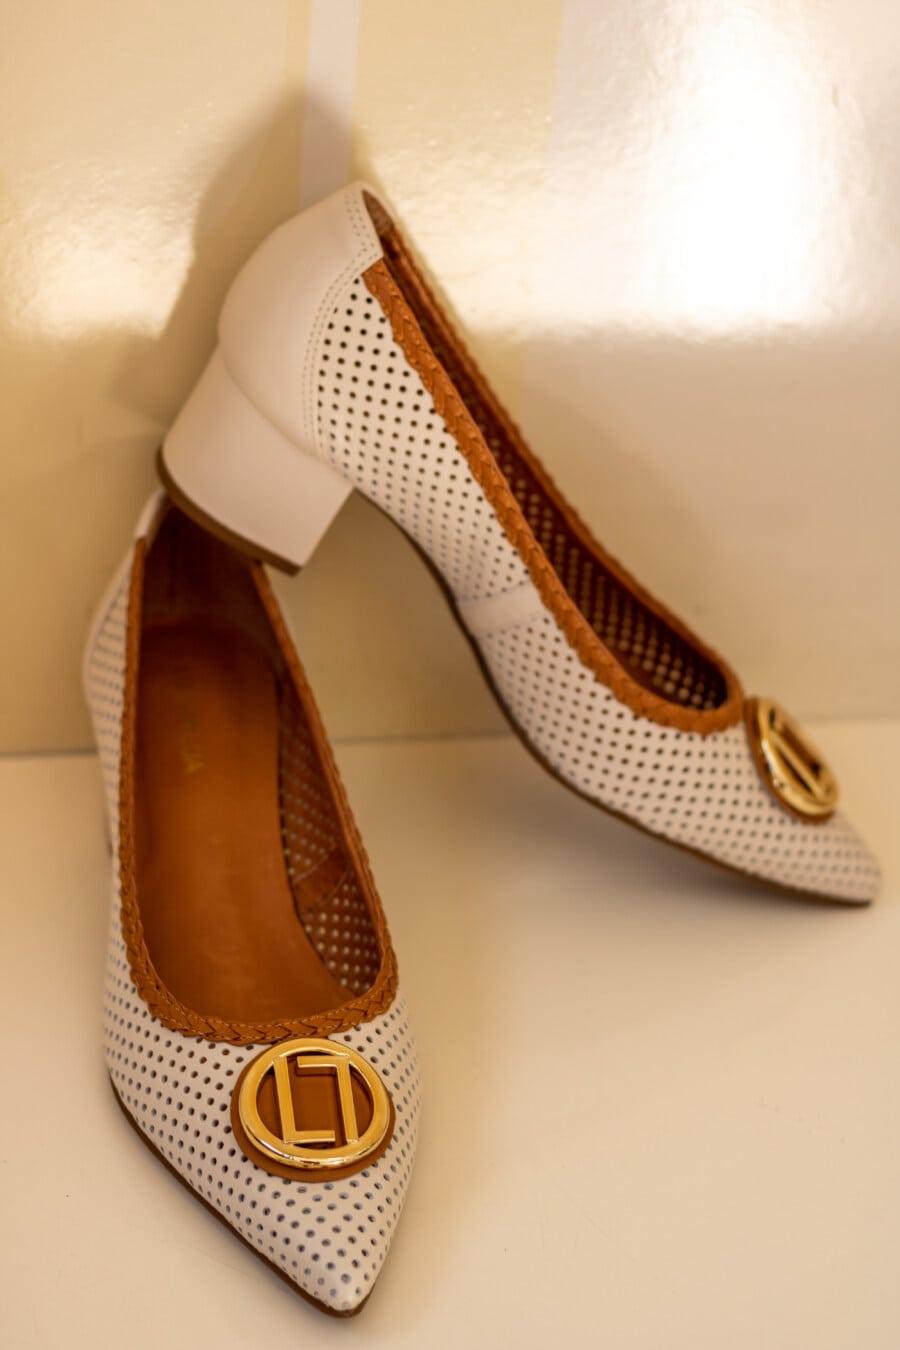 обувки, кожа, светло кафяв, елегантна, случайни, златен блясък, мода, двойка, обувки, Почистване